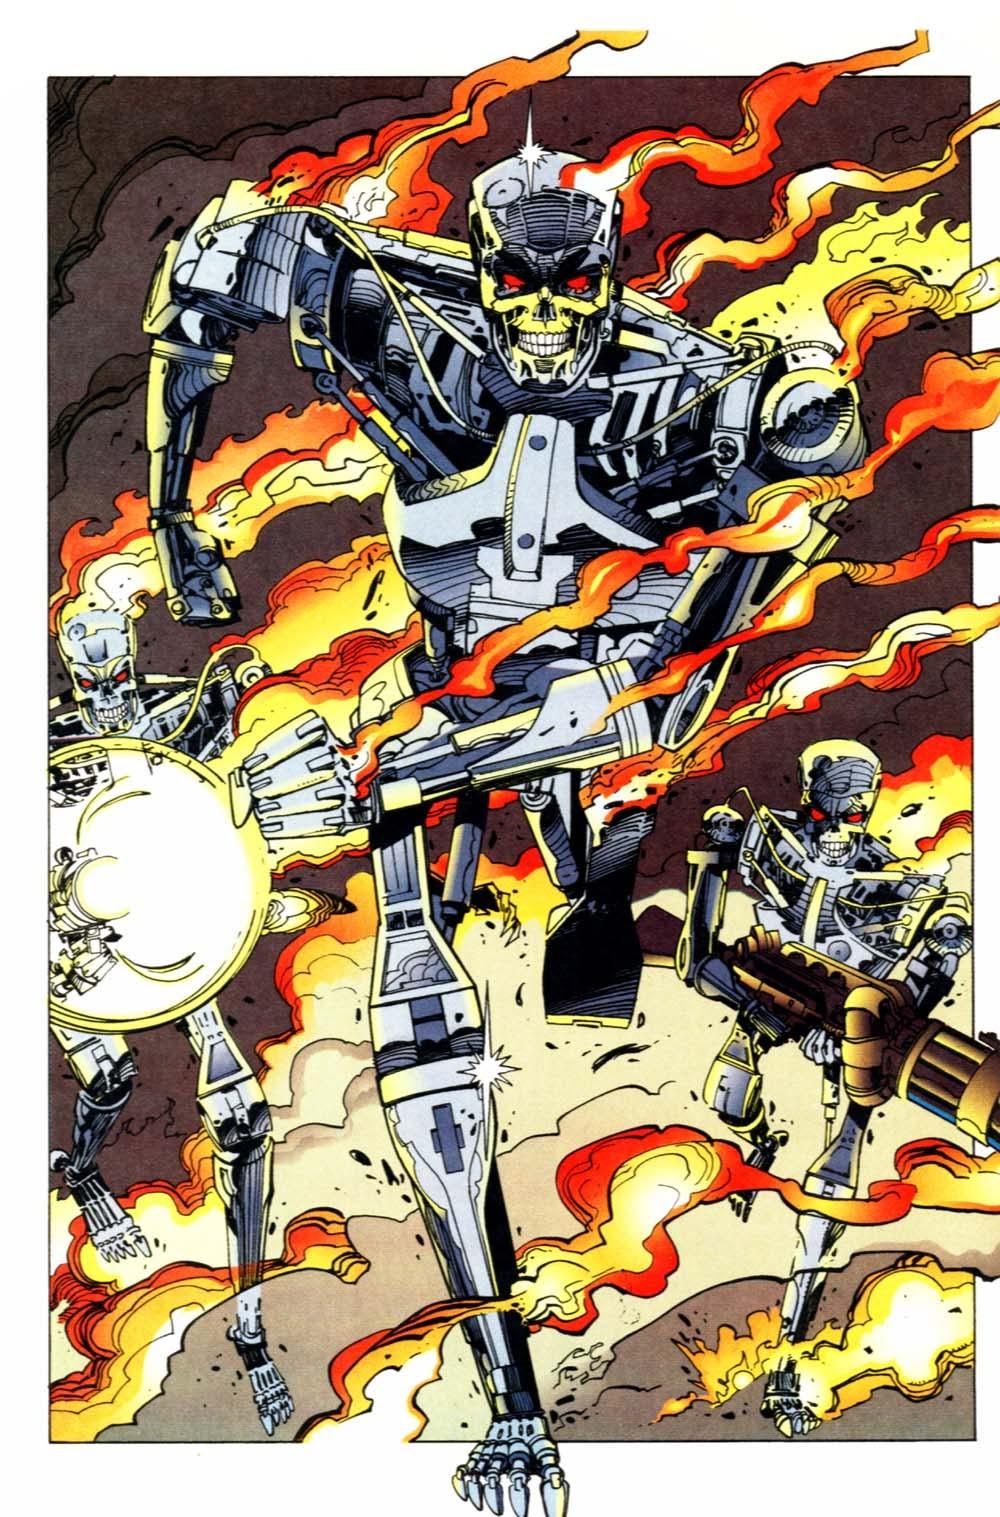 In 'Robocop versus The Terminator' (2014) #2, three Terminators storm a hospital whose mission it is to terminate Robocop.